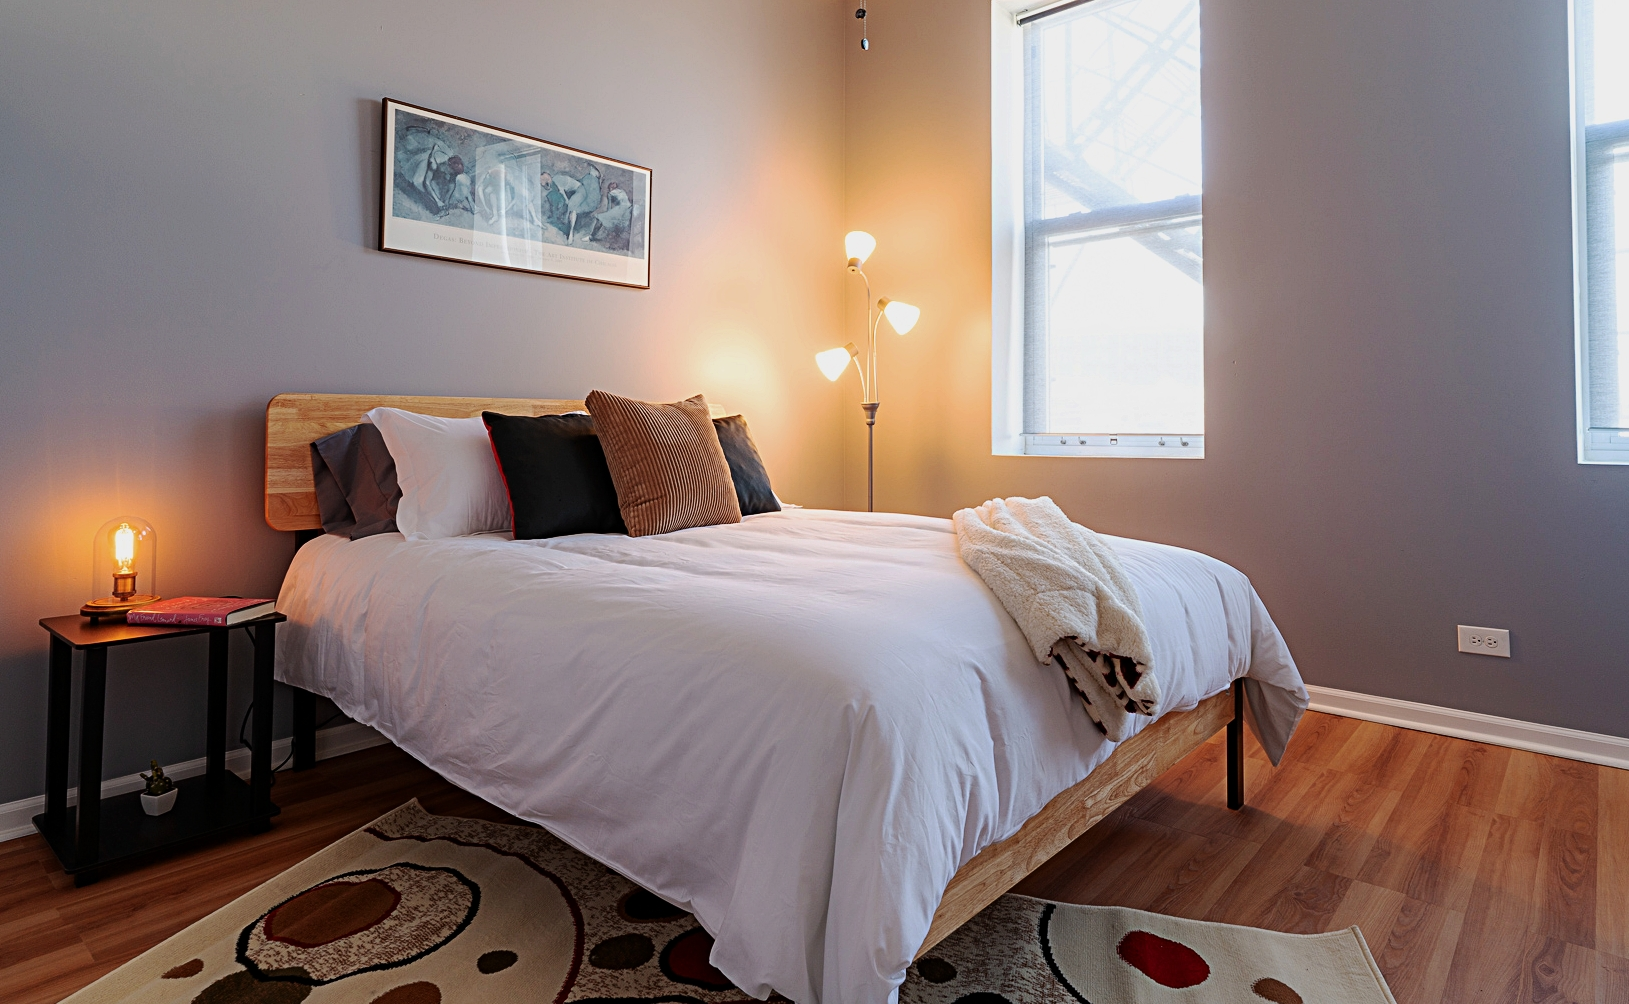 Brillo Stratus Suite (2 bedroom) - Pilsen neighborhood - Chicago, IL